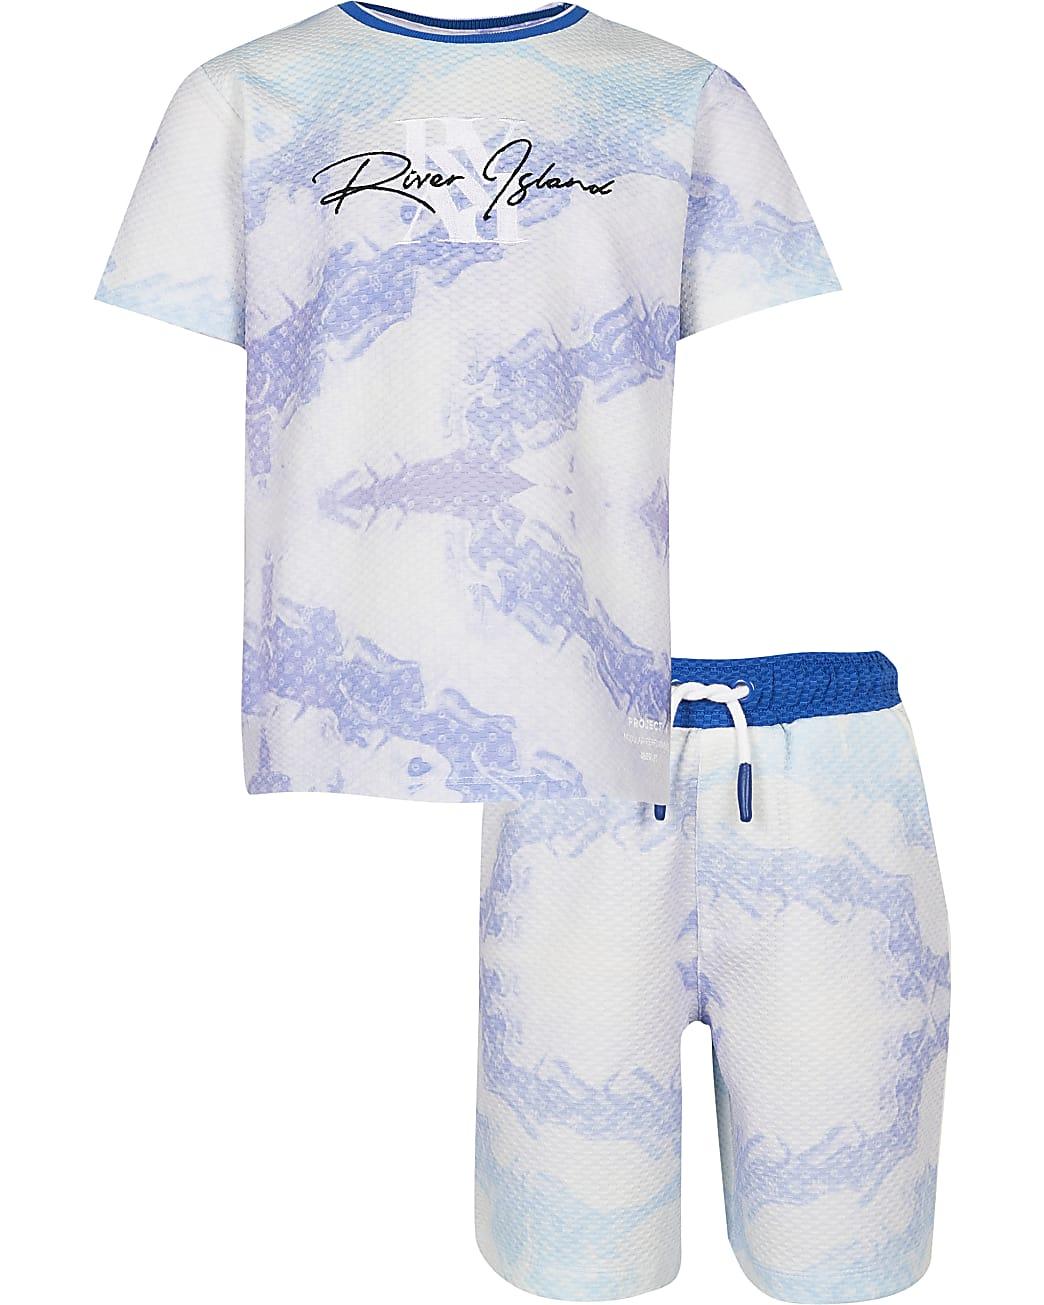 Boys blue RI marble t-shirt and shorts set